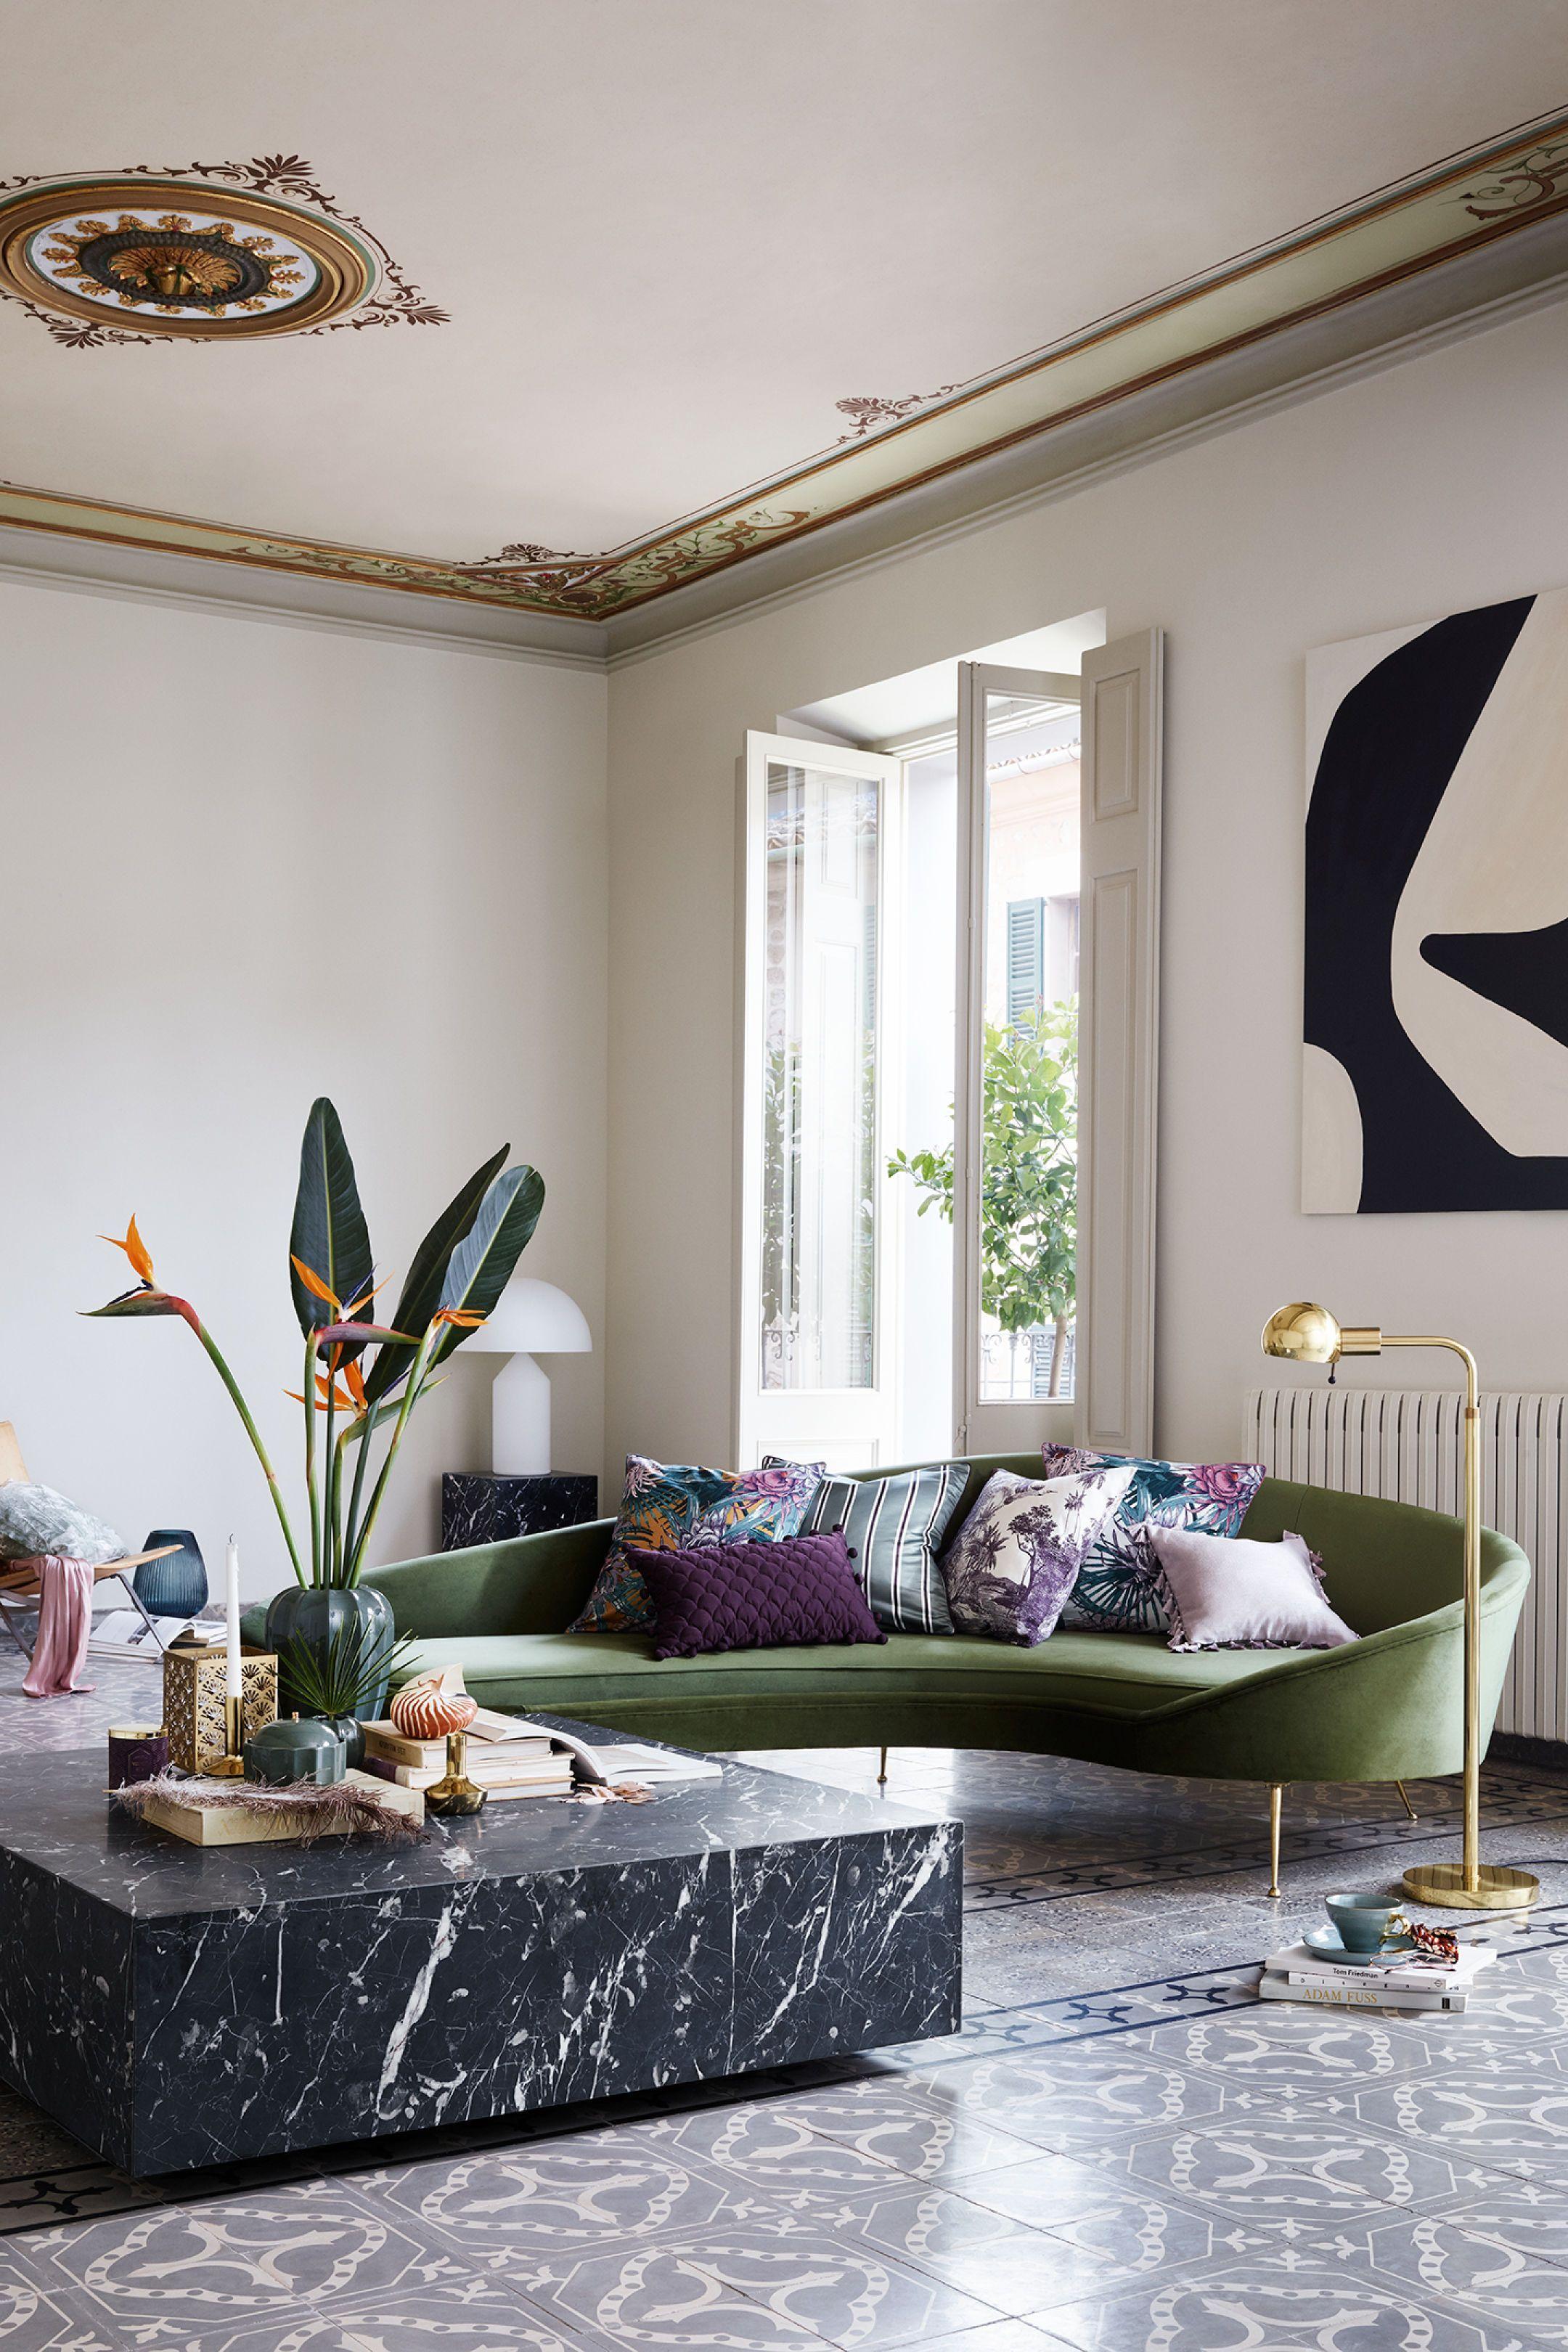 Delightfull visit for dining room ideas mid century modern interiors contemporary interior design luxury home decor also get the best rh pinterest